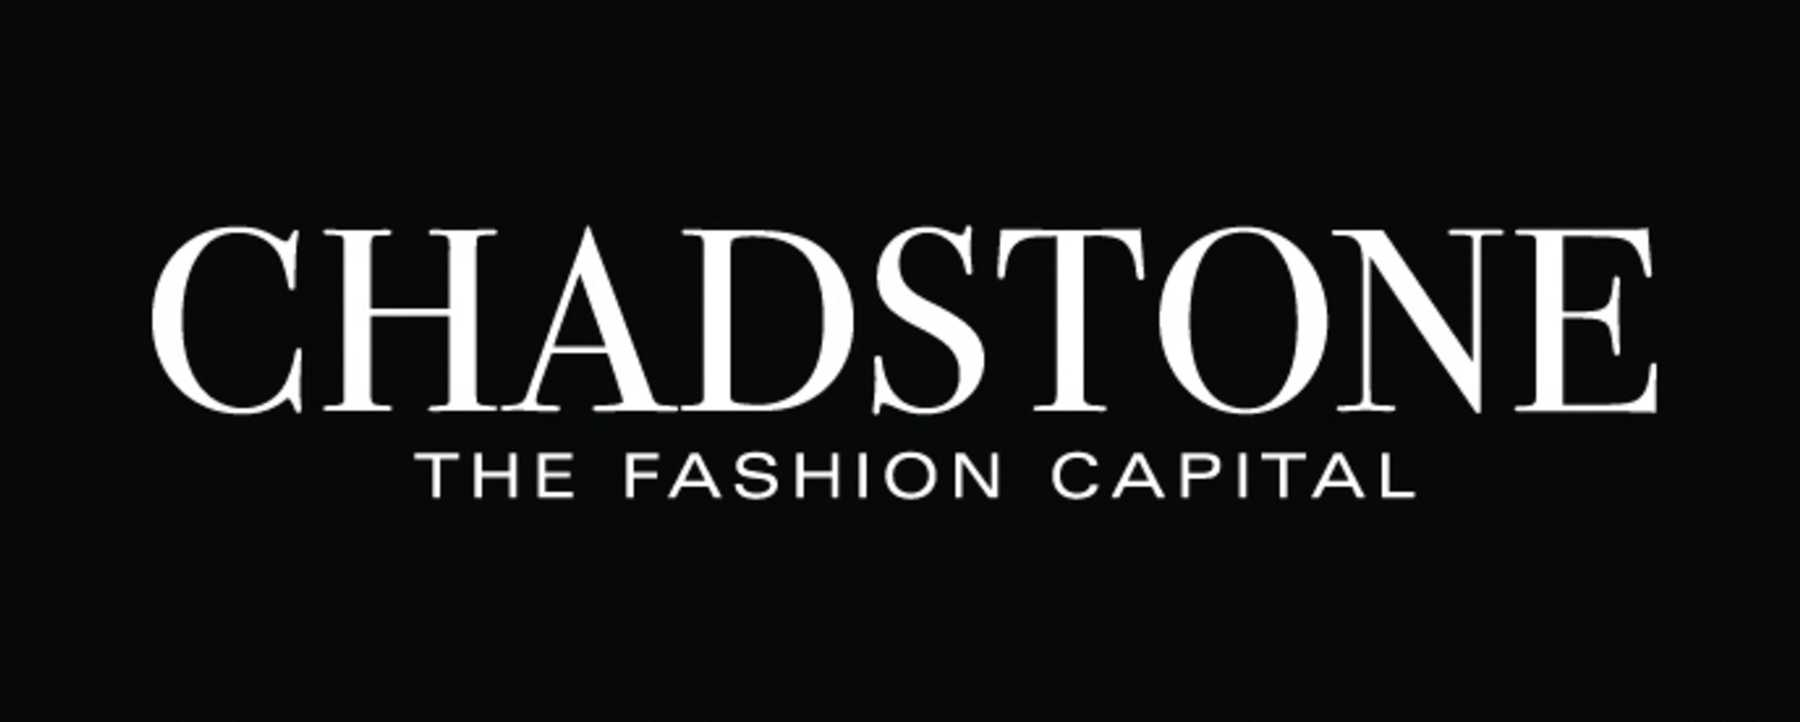 Chadstone_resize